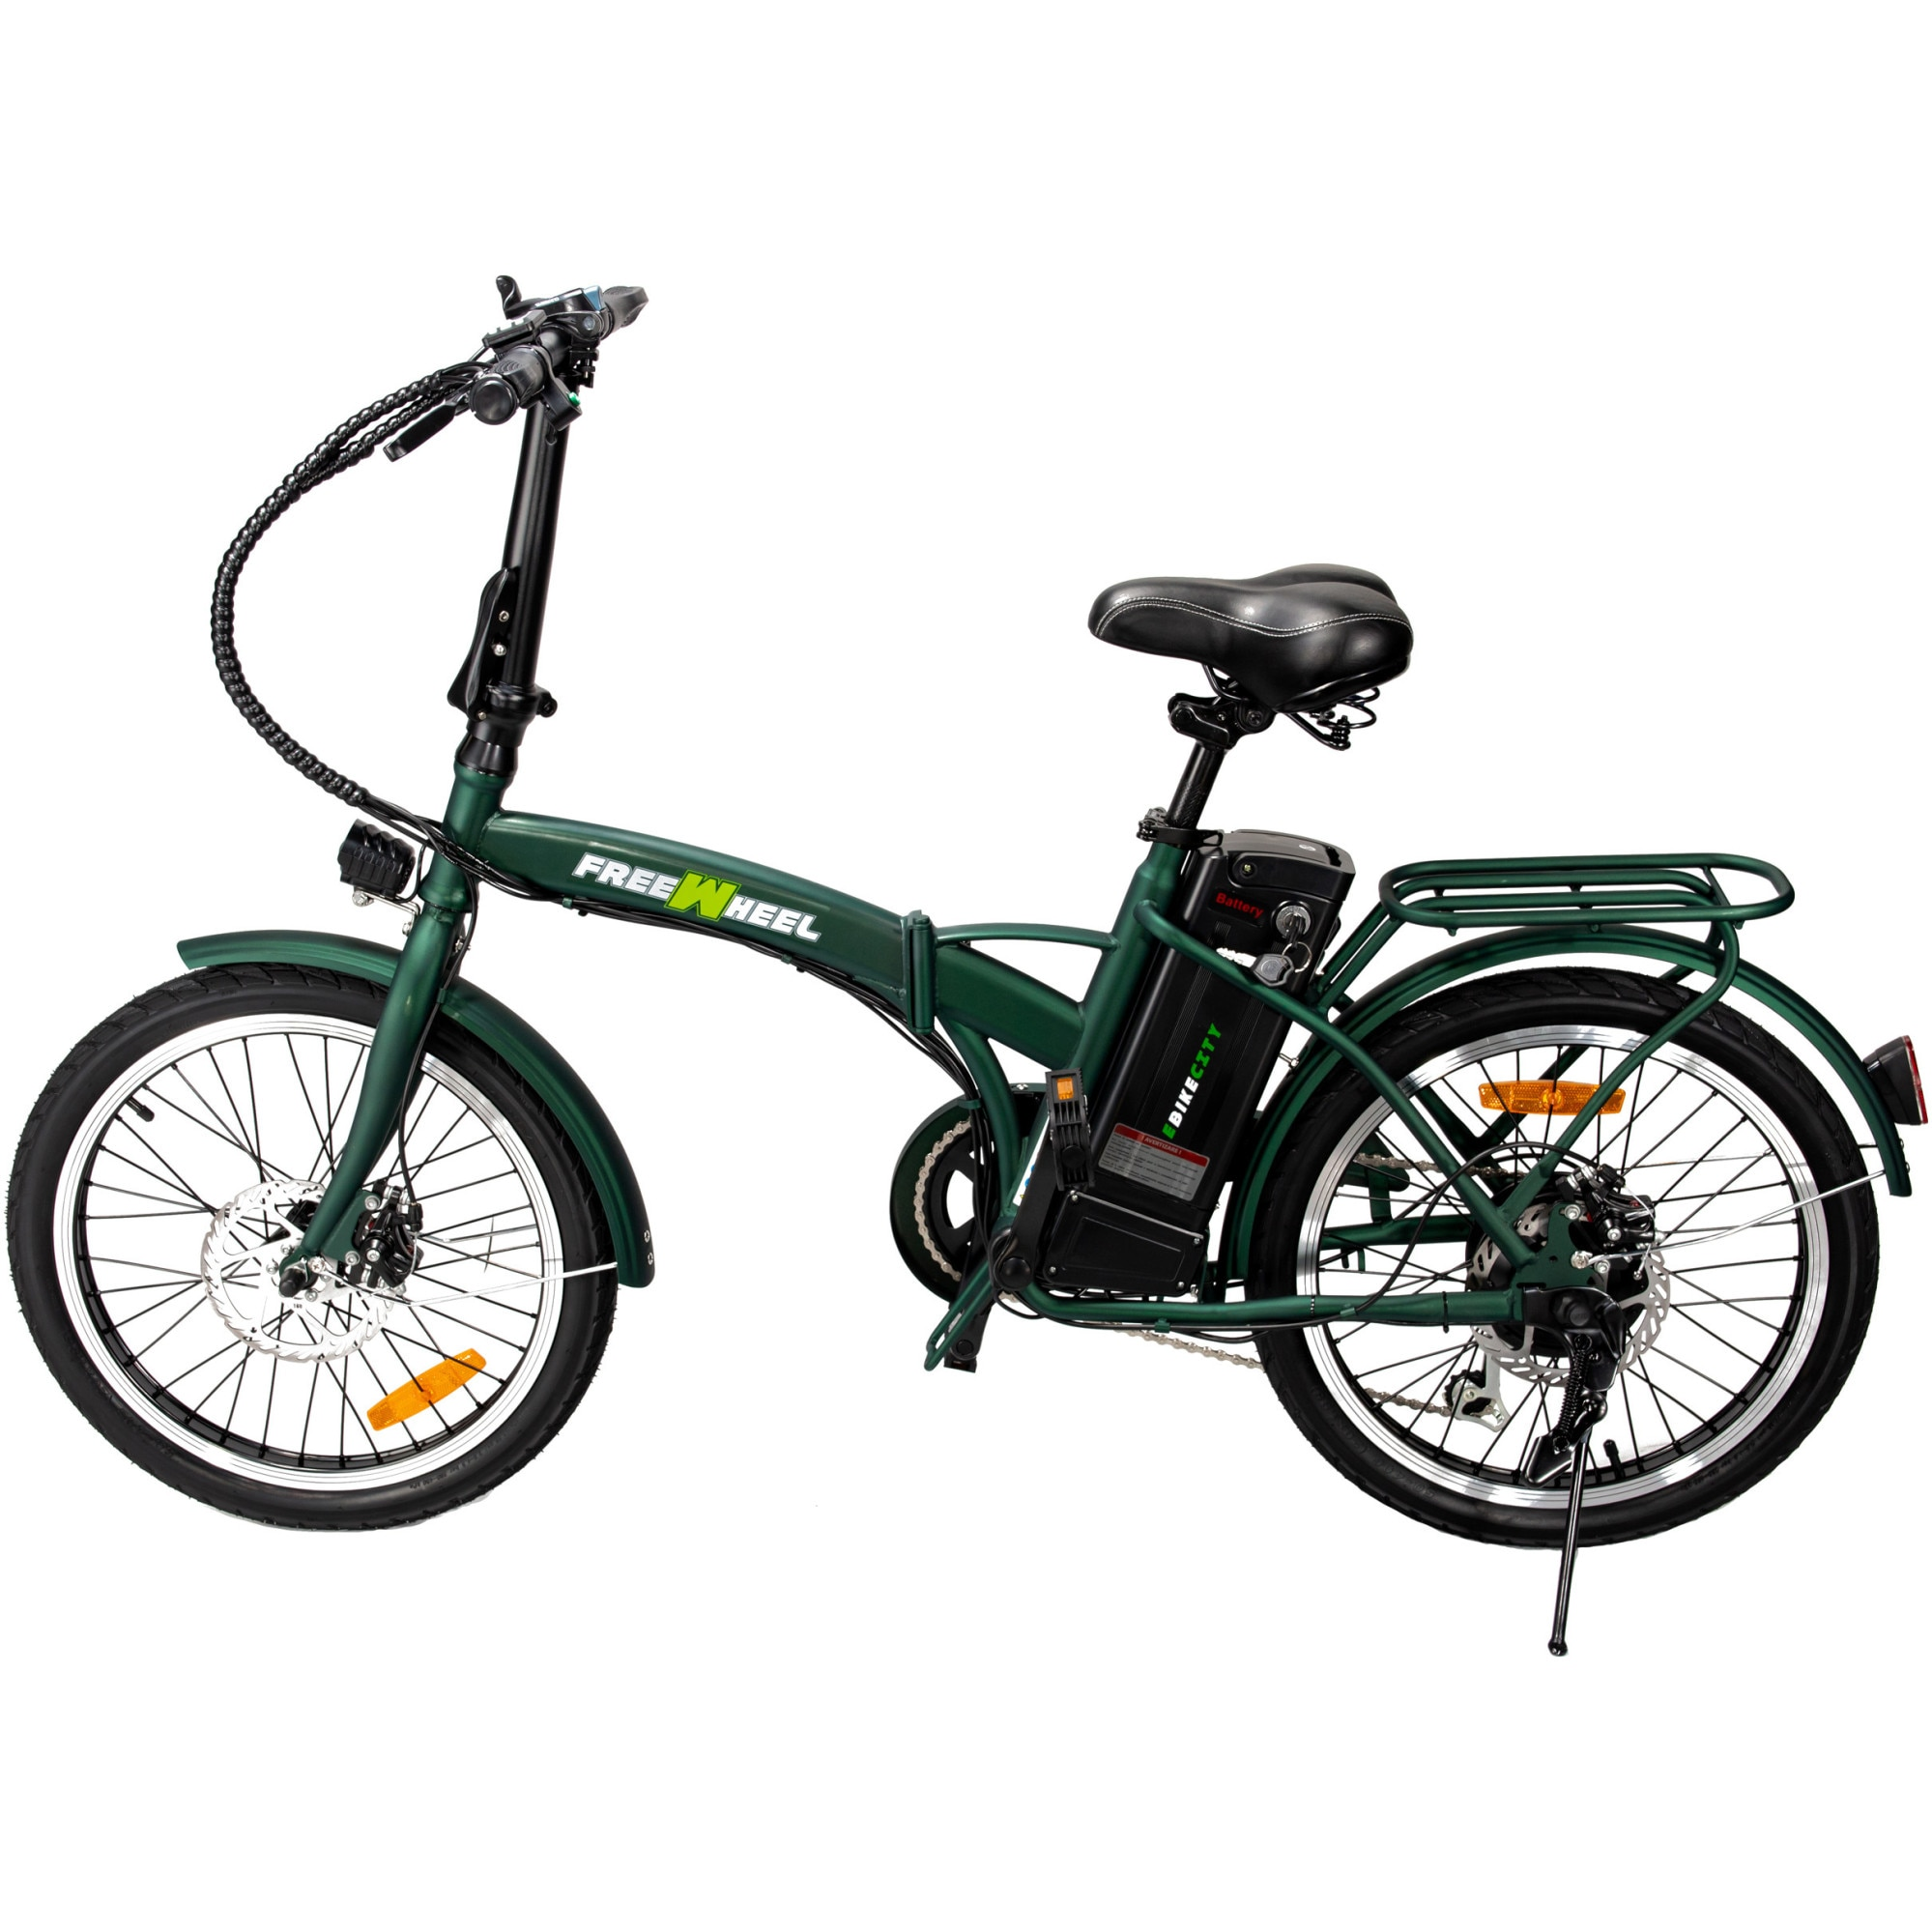 "Fotografie Bicicleta electrica FreeWheel E-bike City, Pliabila, Roti 20"", Frana disc fata/spate, Motor 250W, Autonomie pana la 35Km, Viteza maxima 25Km/h, Verde"